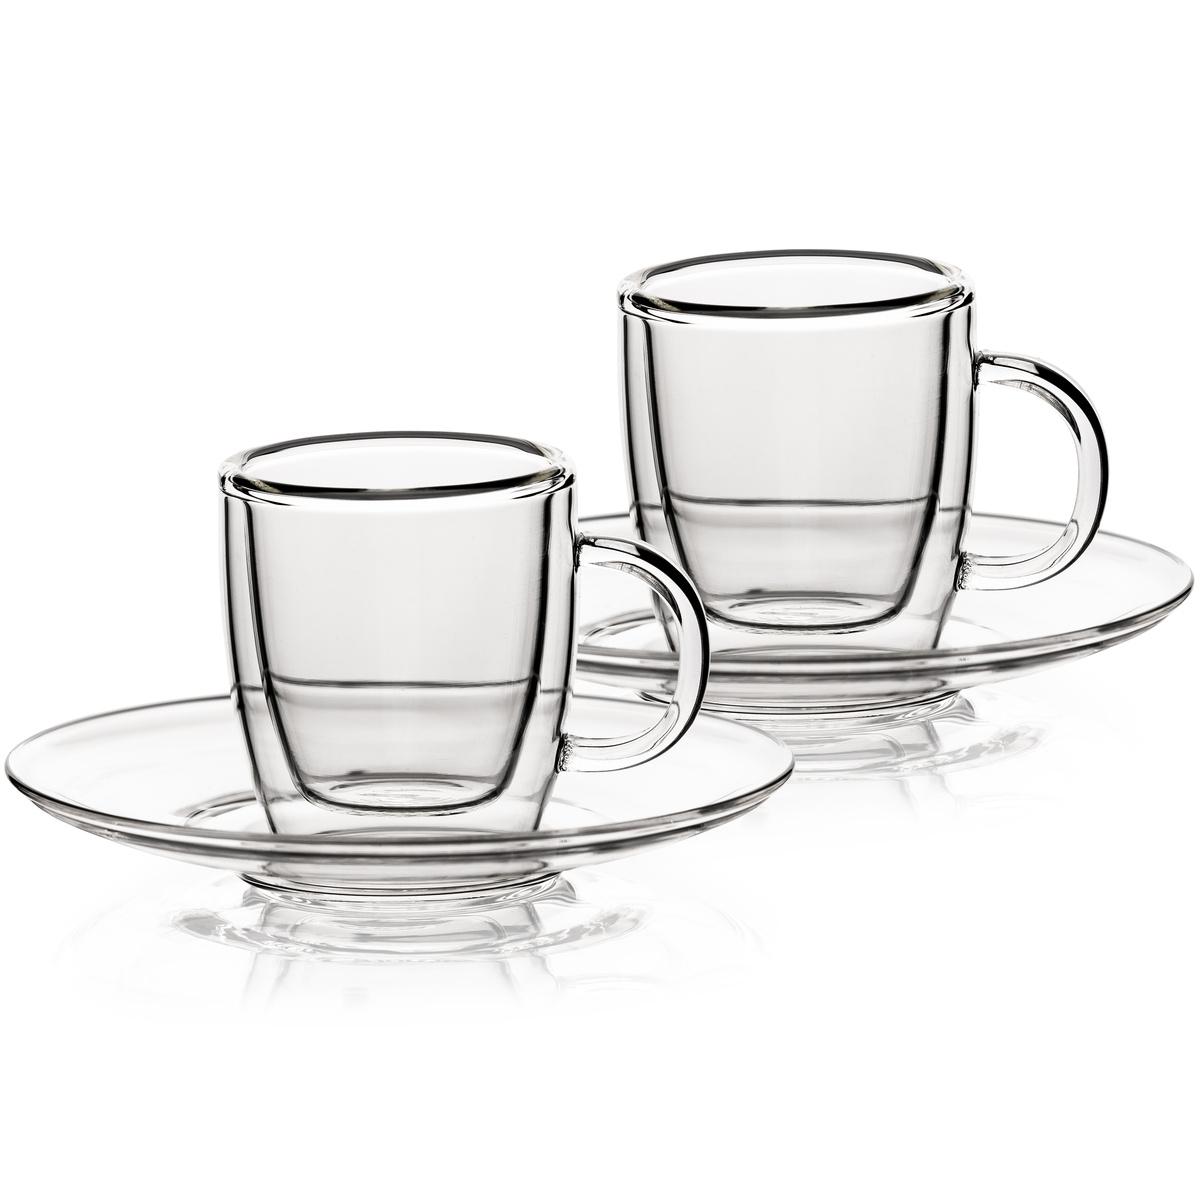 Produktové foto 4home Termo sklenice Ristretto Hot&Cool, 50 ml, 2 ks